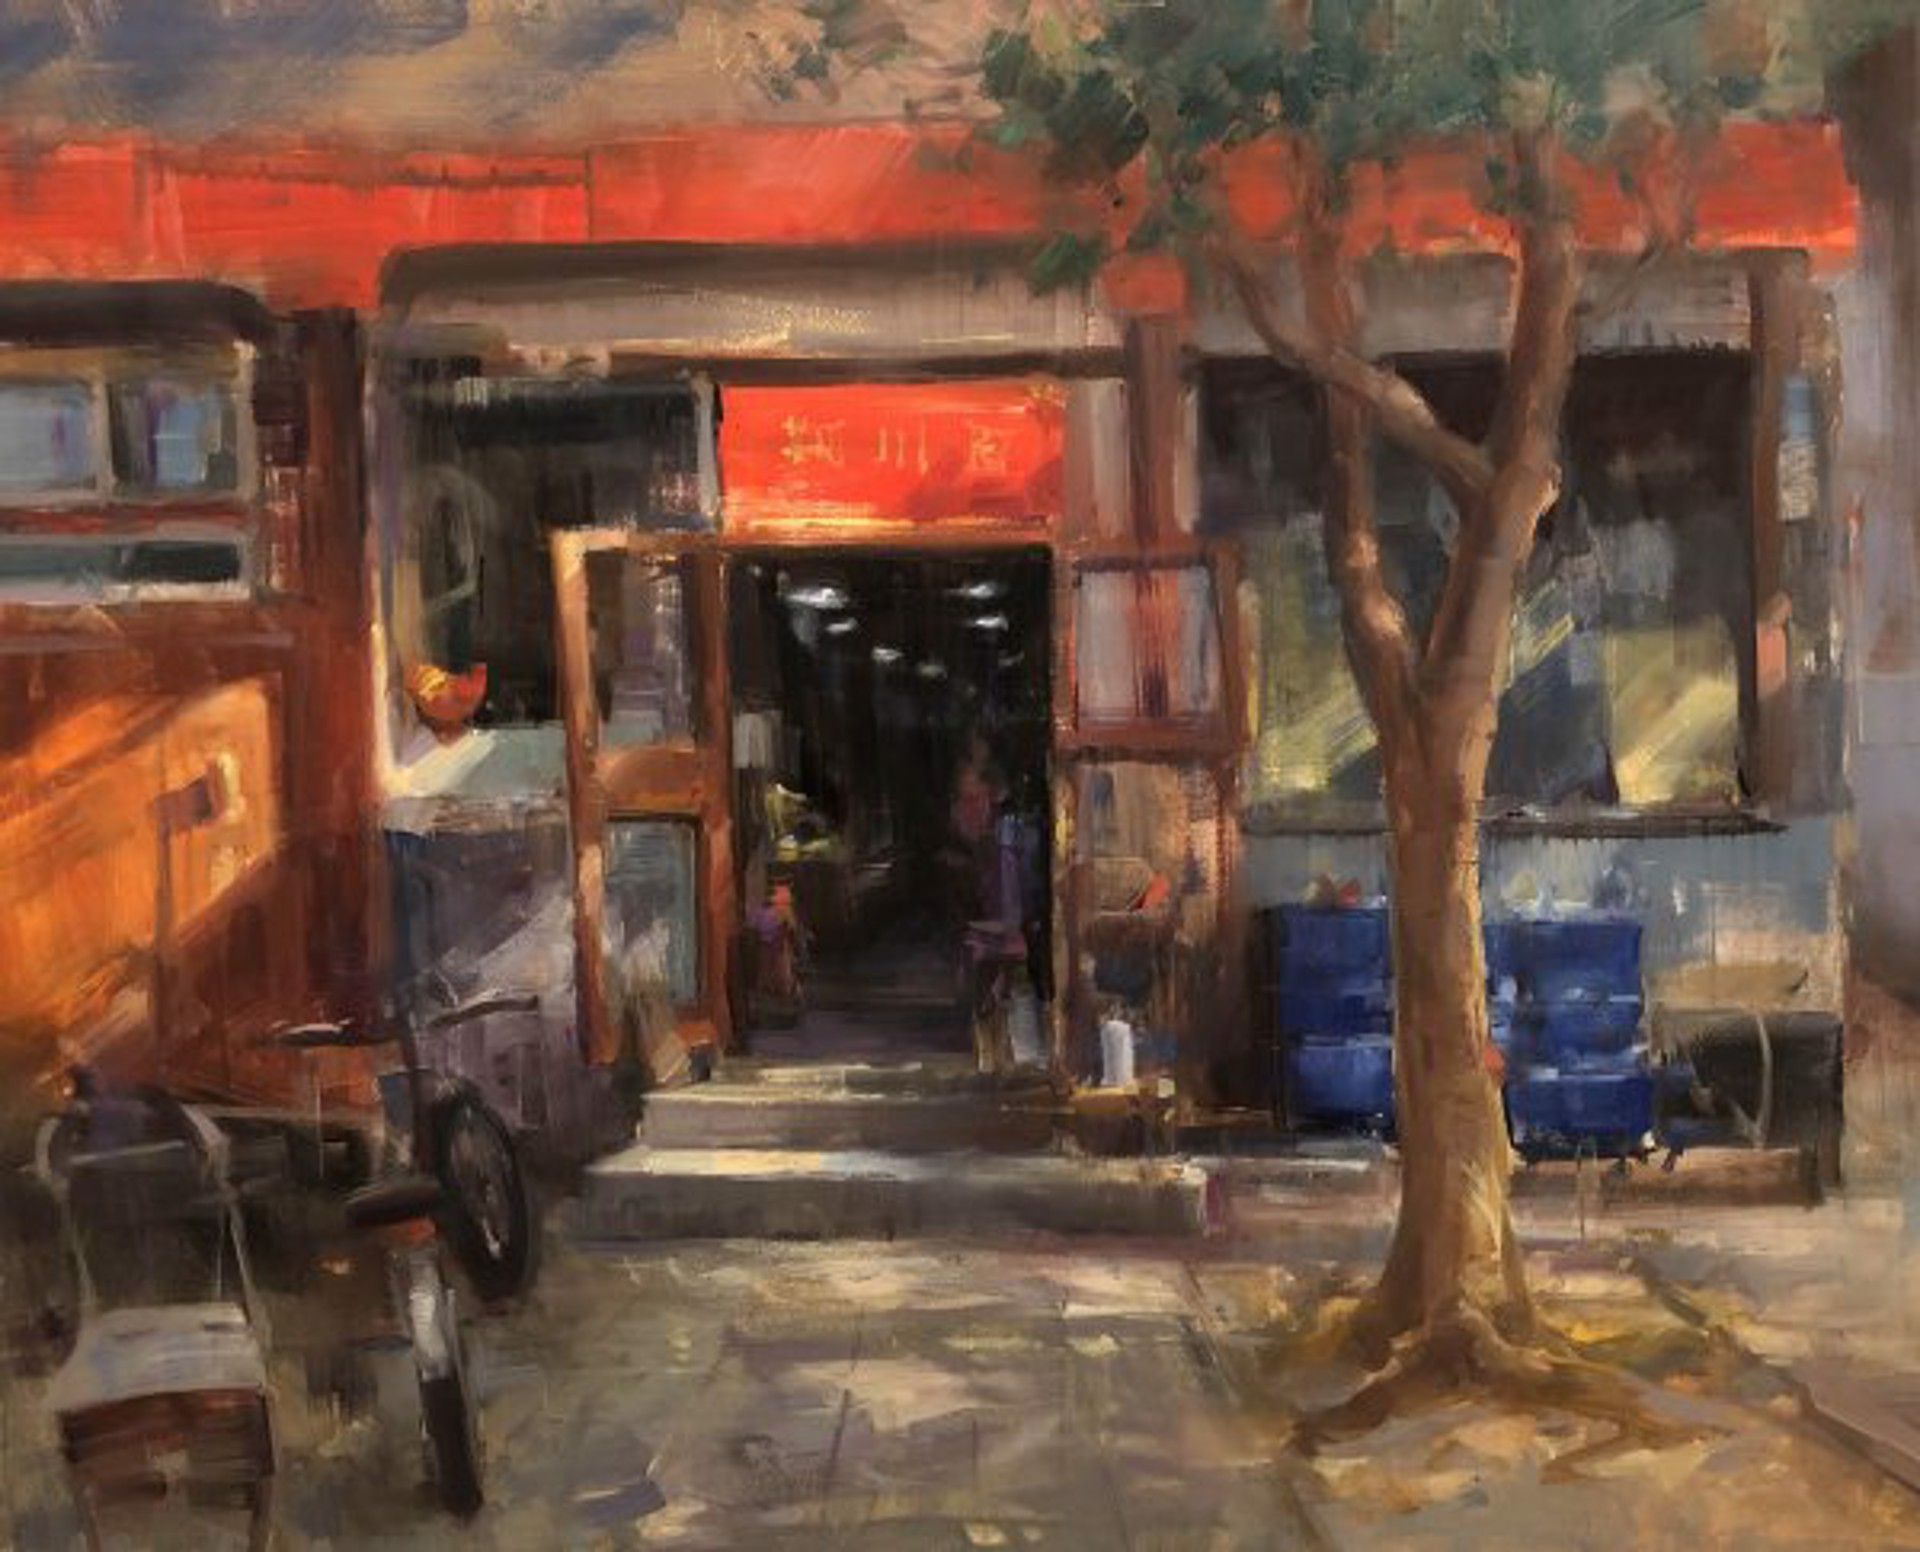 Dumpling Shop by Bryan Mark Taylor